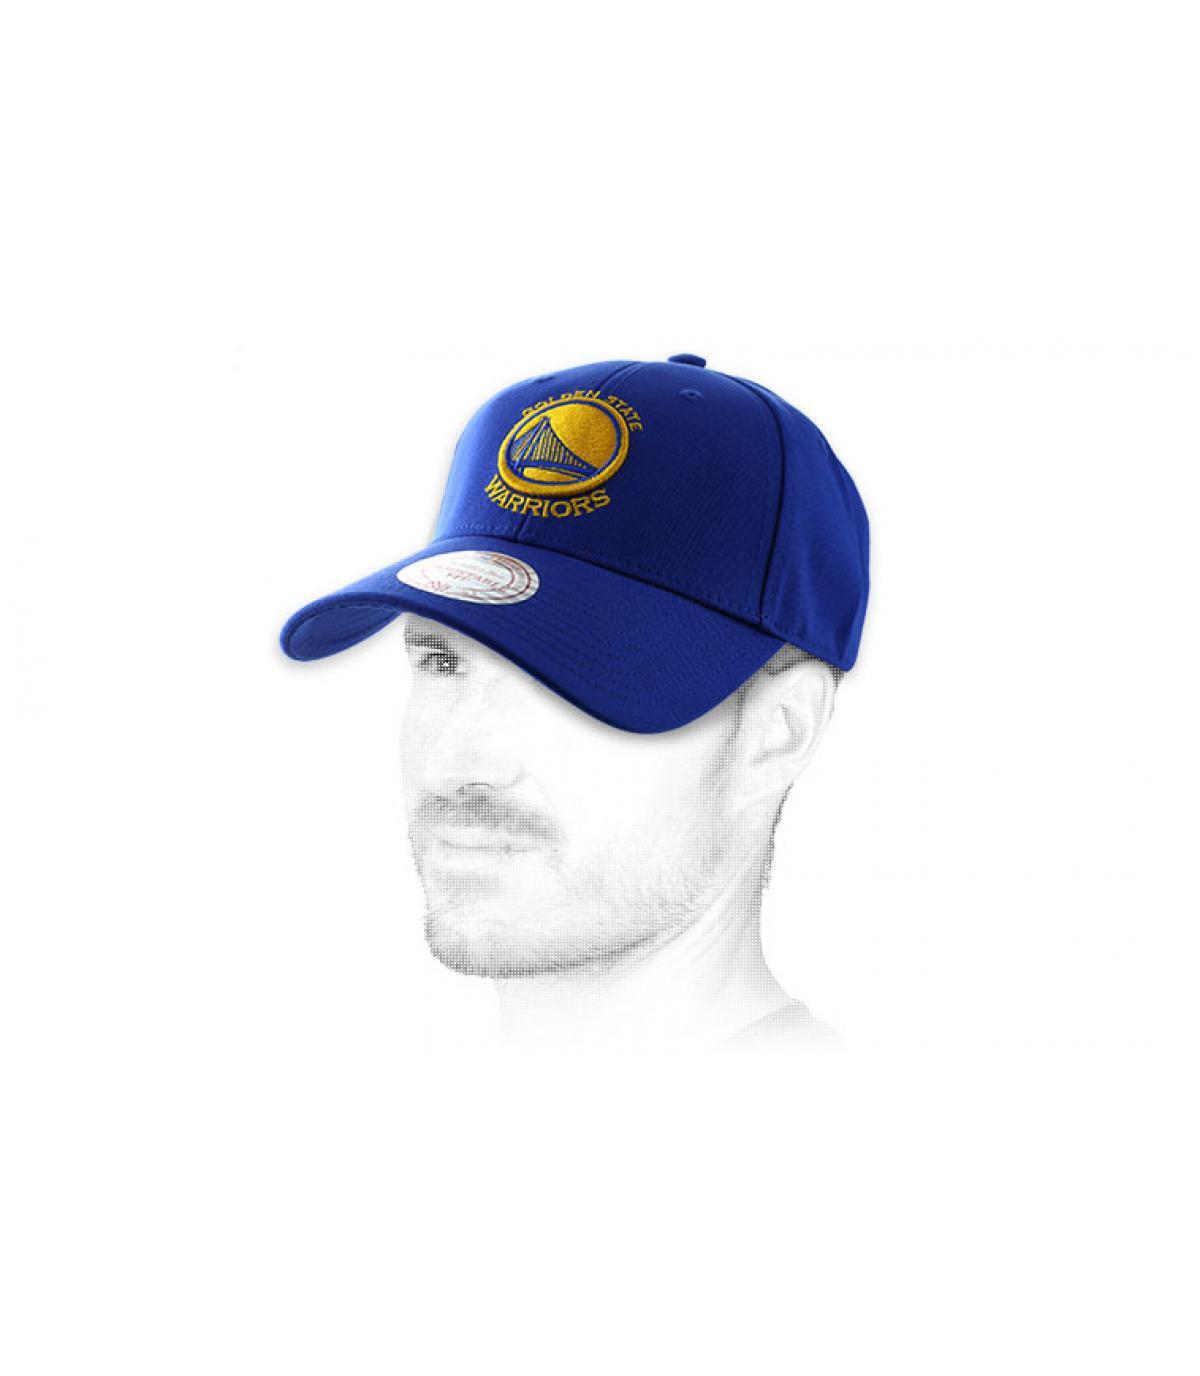 Warriors Golden State cap